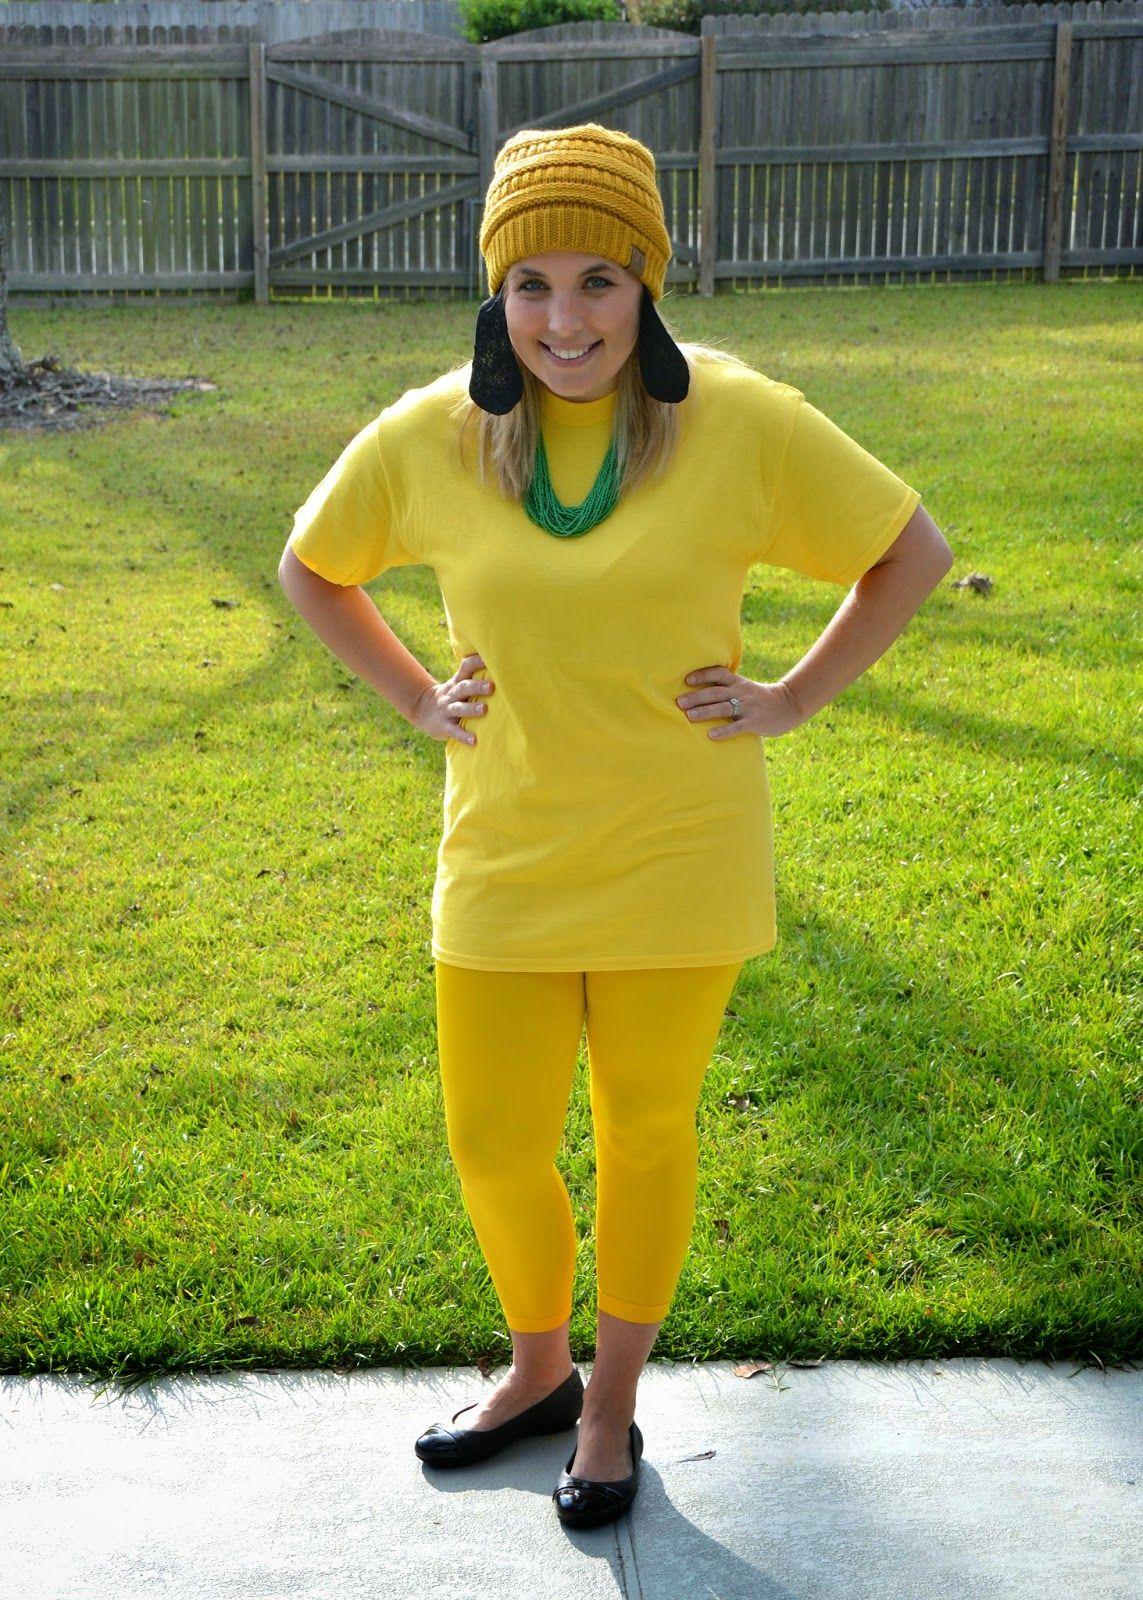 Diy pluto costume for adult Disney Halloween Parker